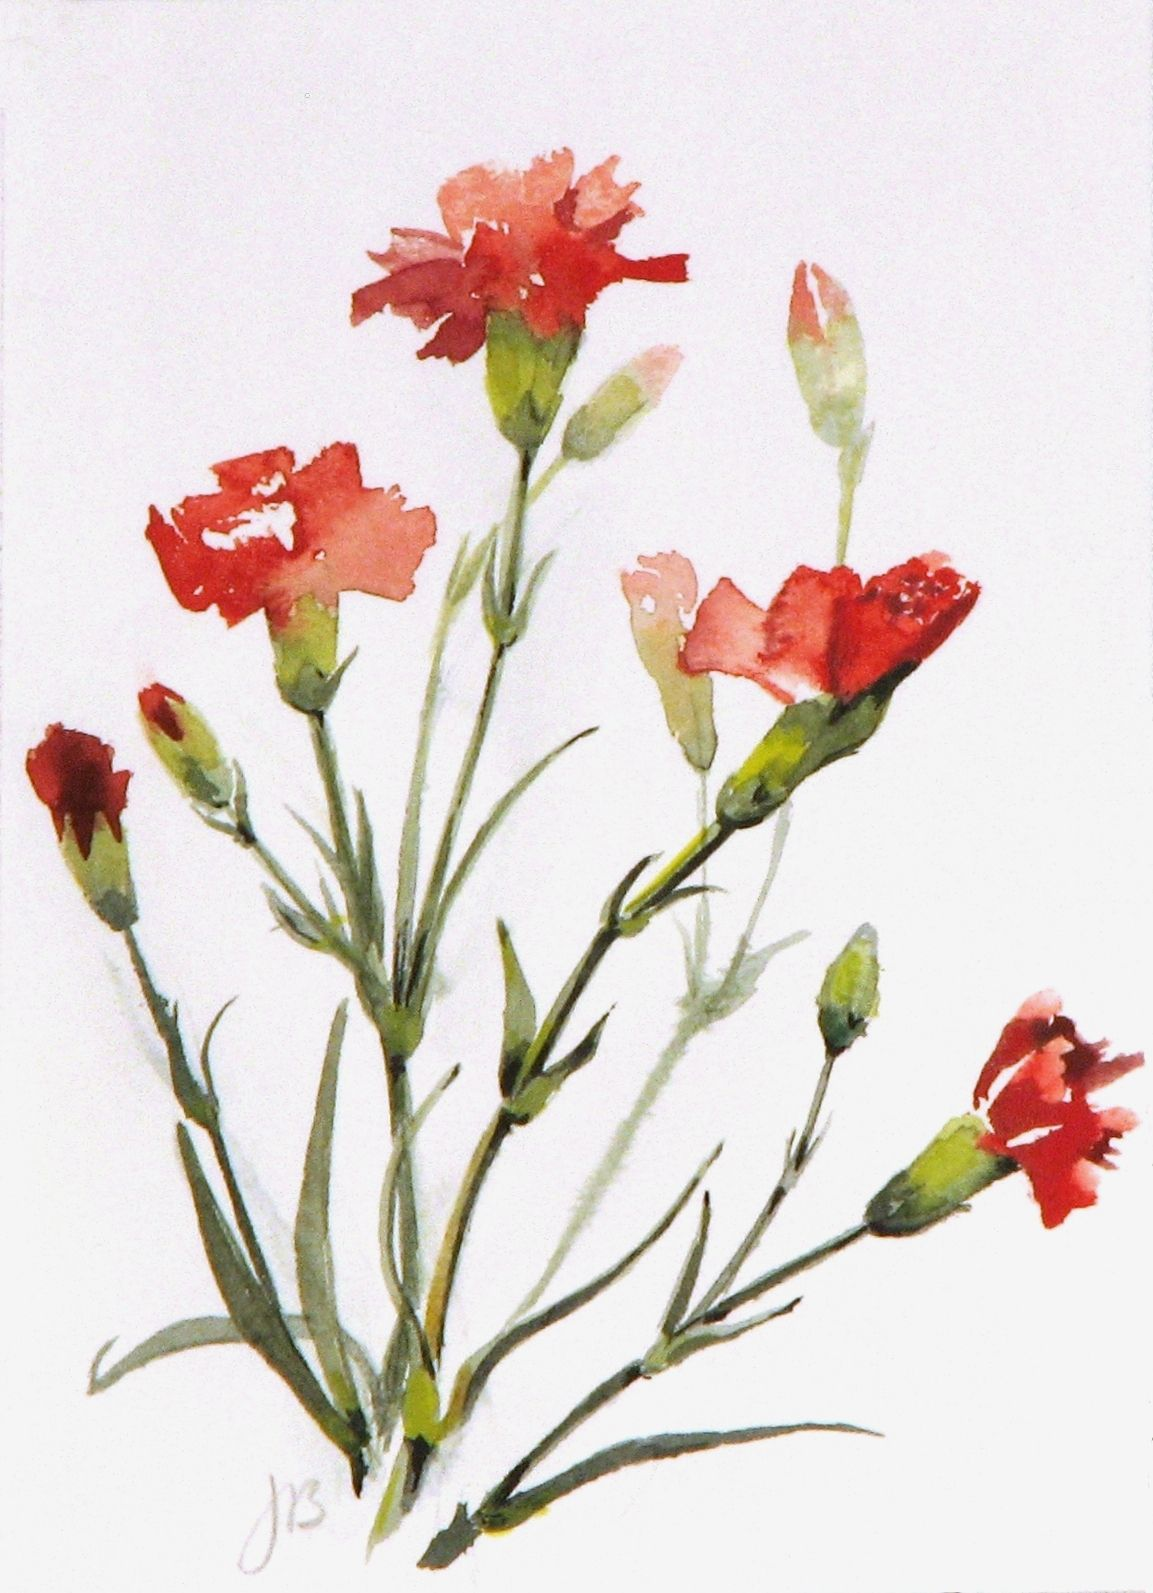 Drawn Carnation Watercolor 8 수채화 양귀비 수채화 아트 작은 그림